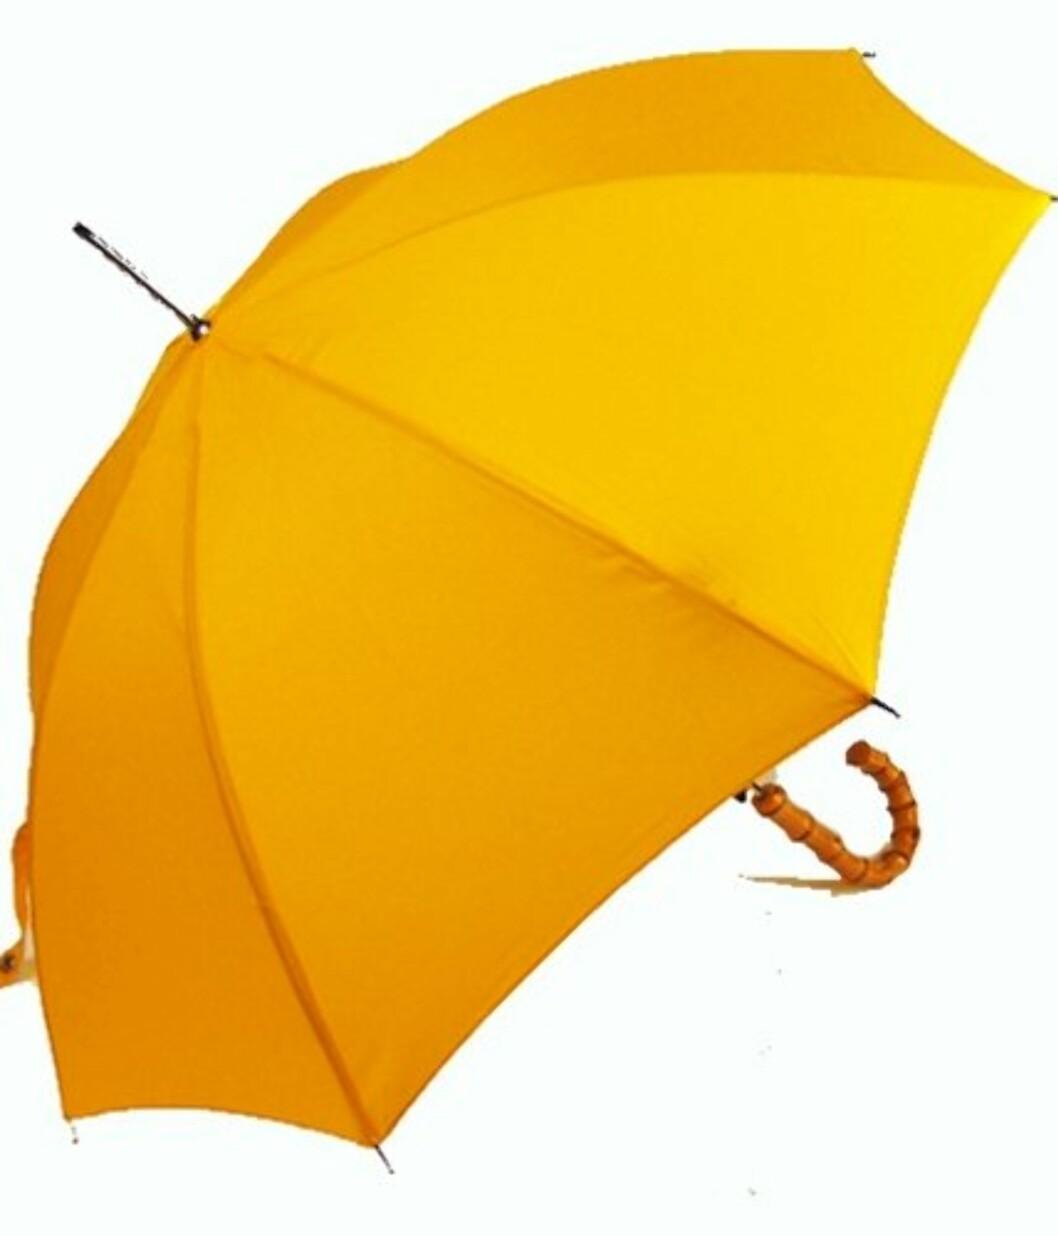 Solgul paraply med bambushank (ca kr.245/Umbrellas.net). Foto: Produsenten